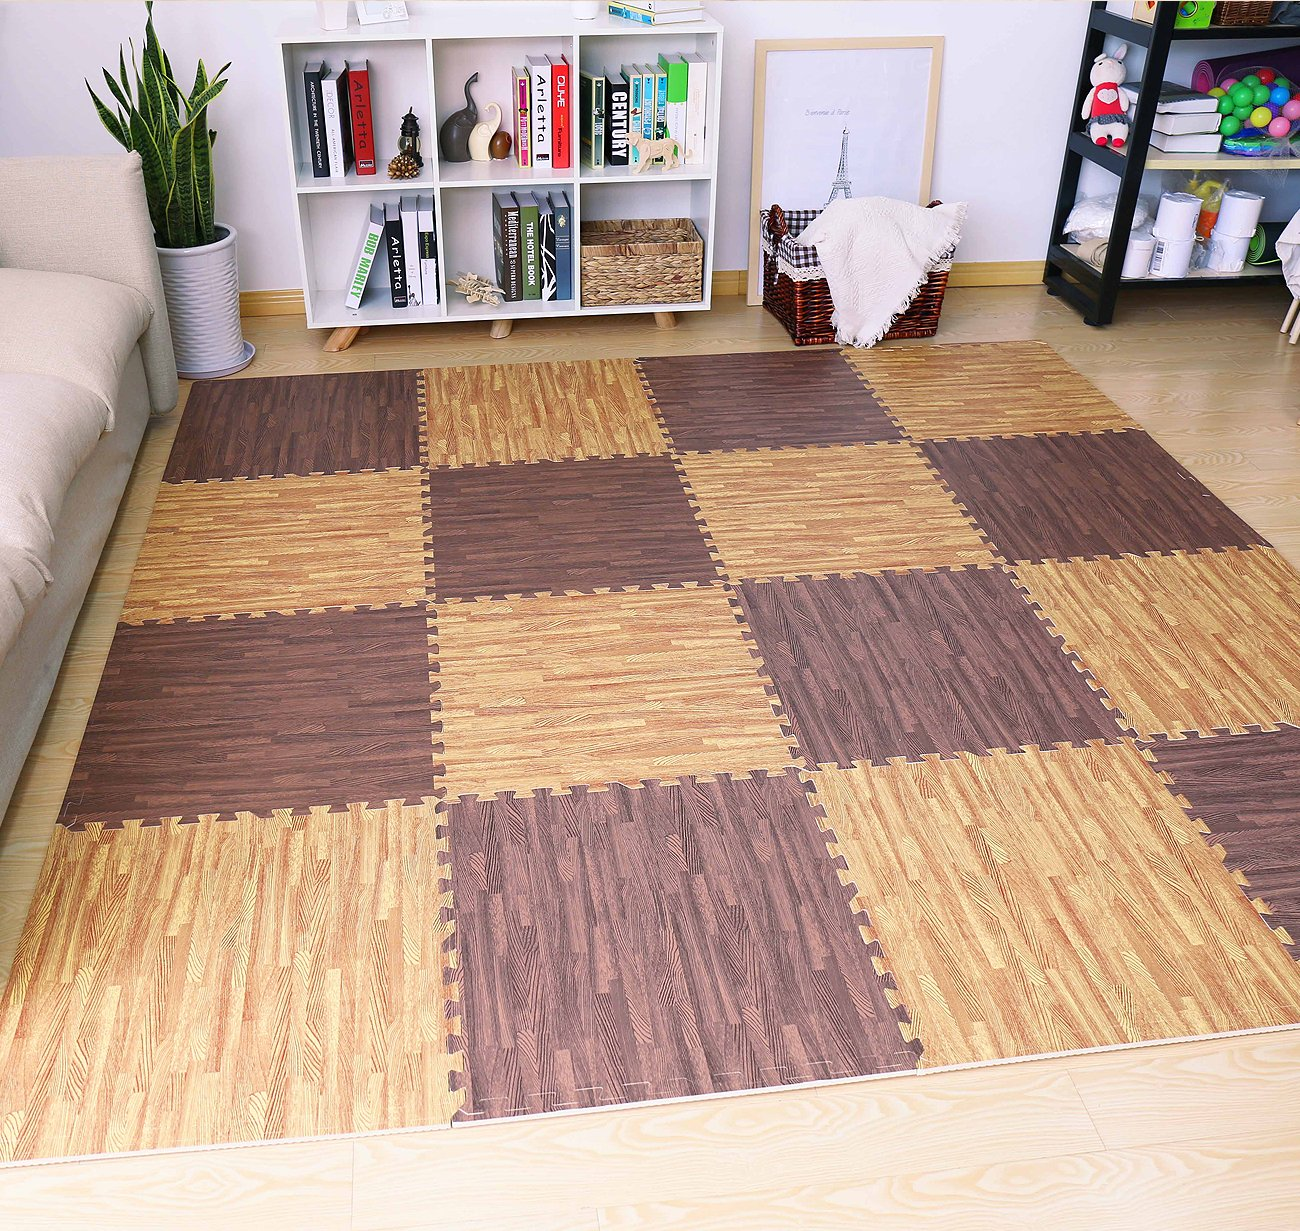 Sorbus Interlocking Floor Mat Print, Wood Grain - Light (6-Piece) by Sorbus (Image #5)